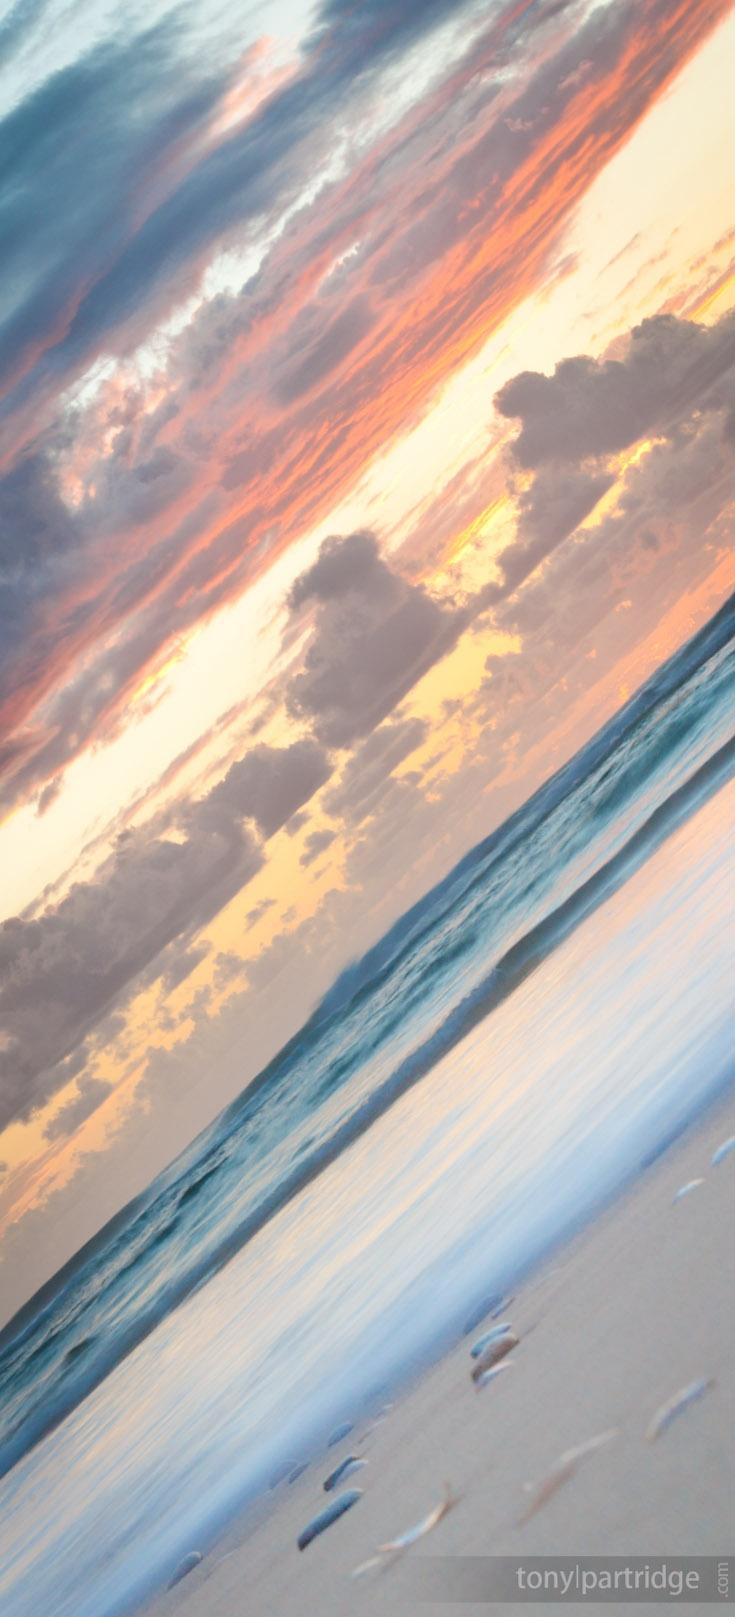 Sunrise at Lighthouse Beach, Ballina NSW. #Seascape #Photography